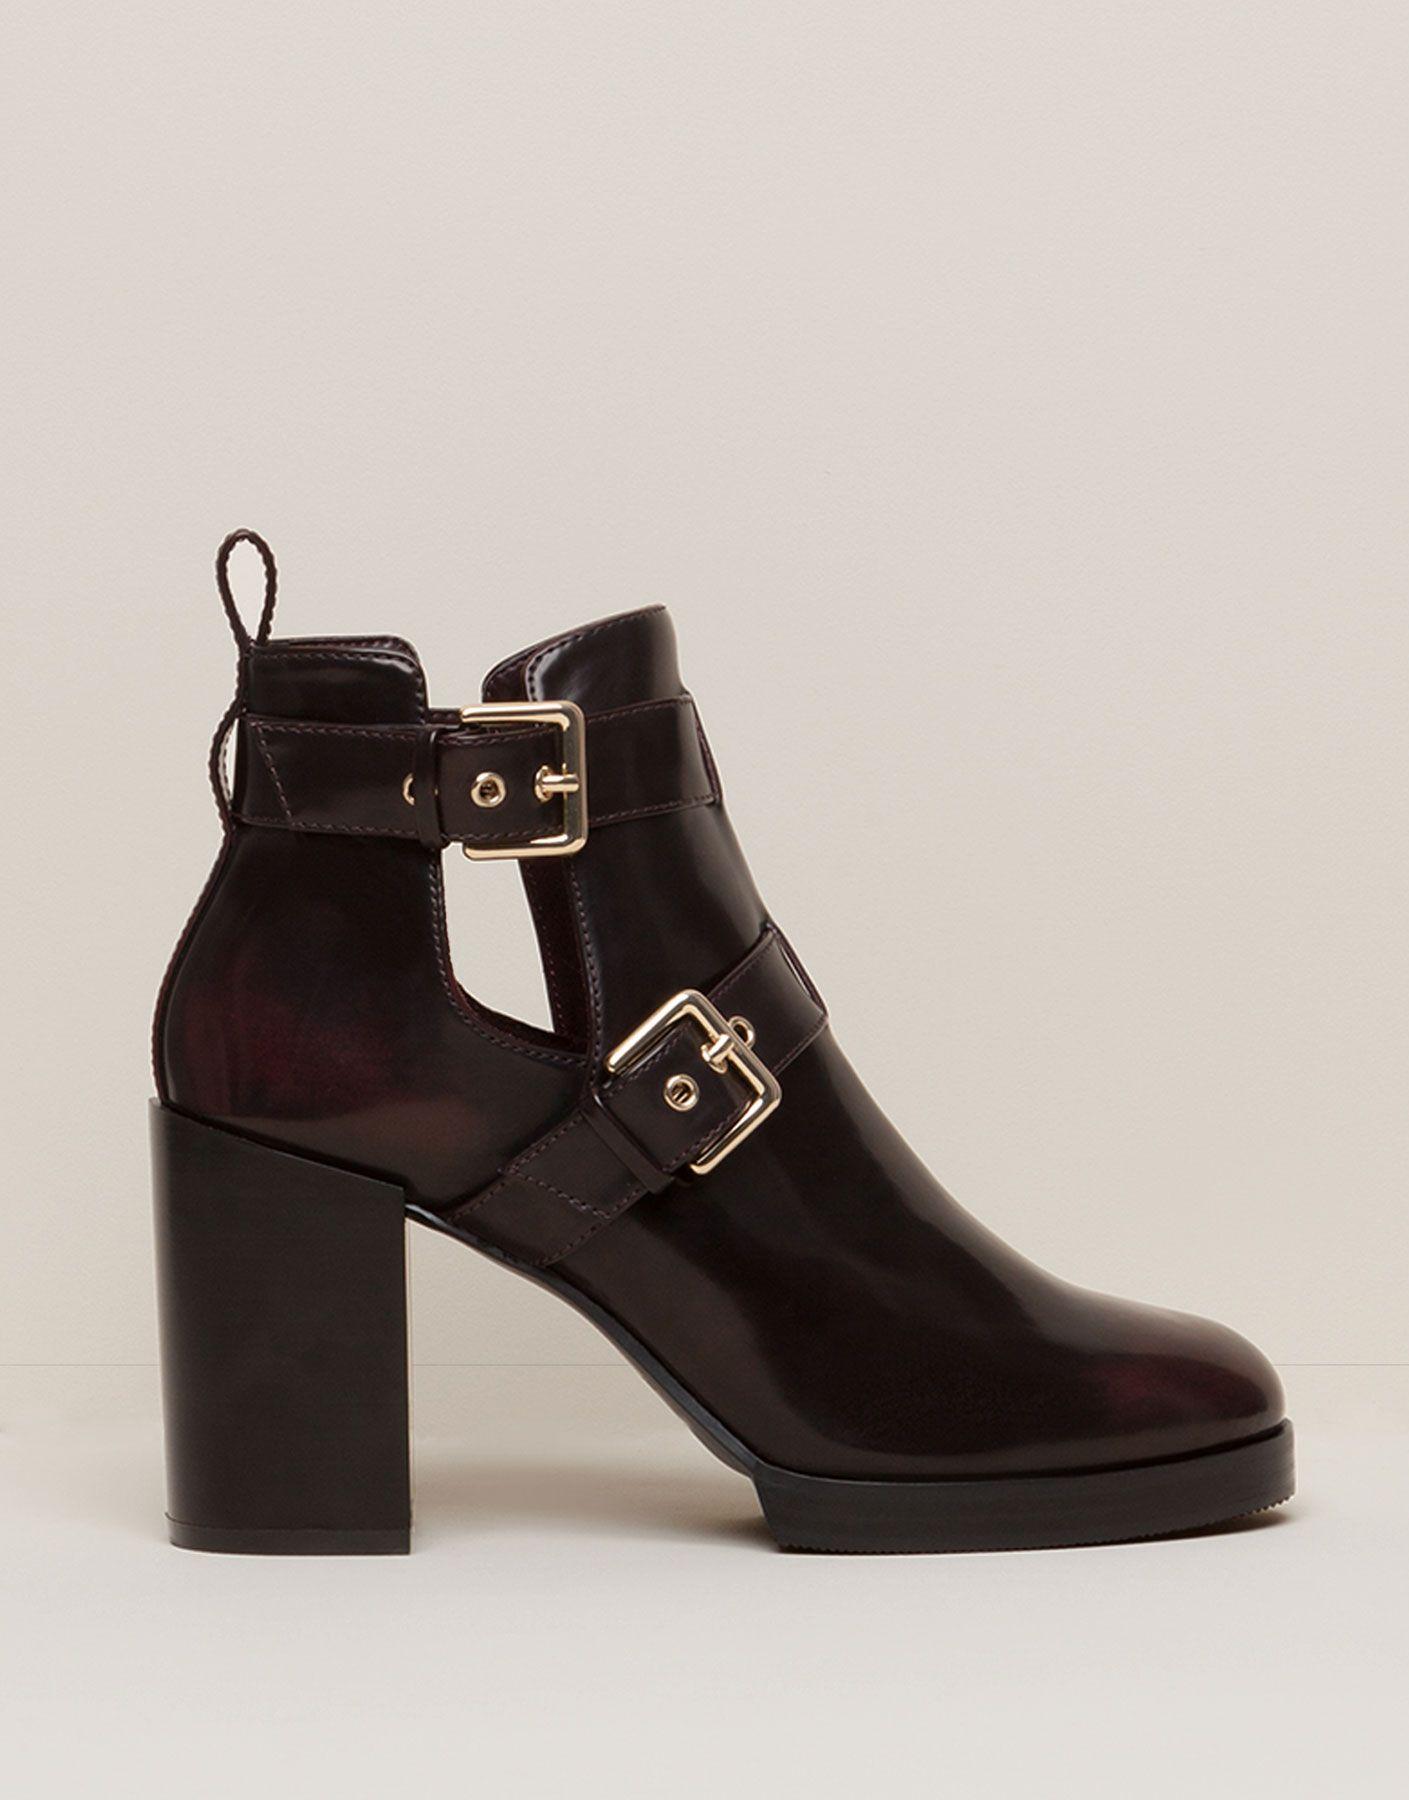 bottines talon 2 boucles | shoes-ista | pinterest | bottine talon